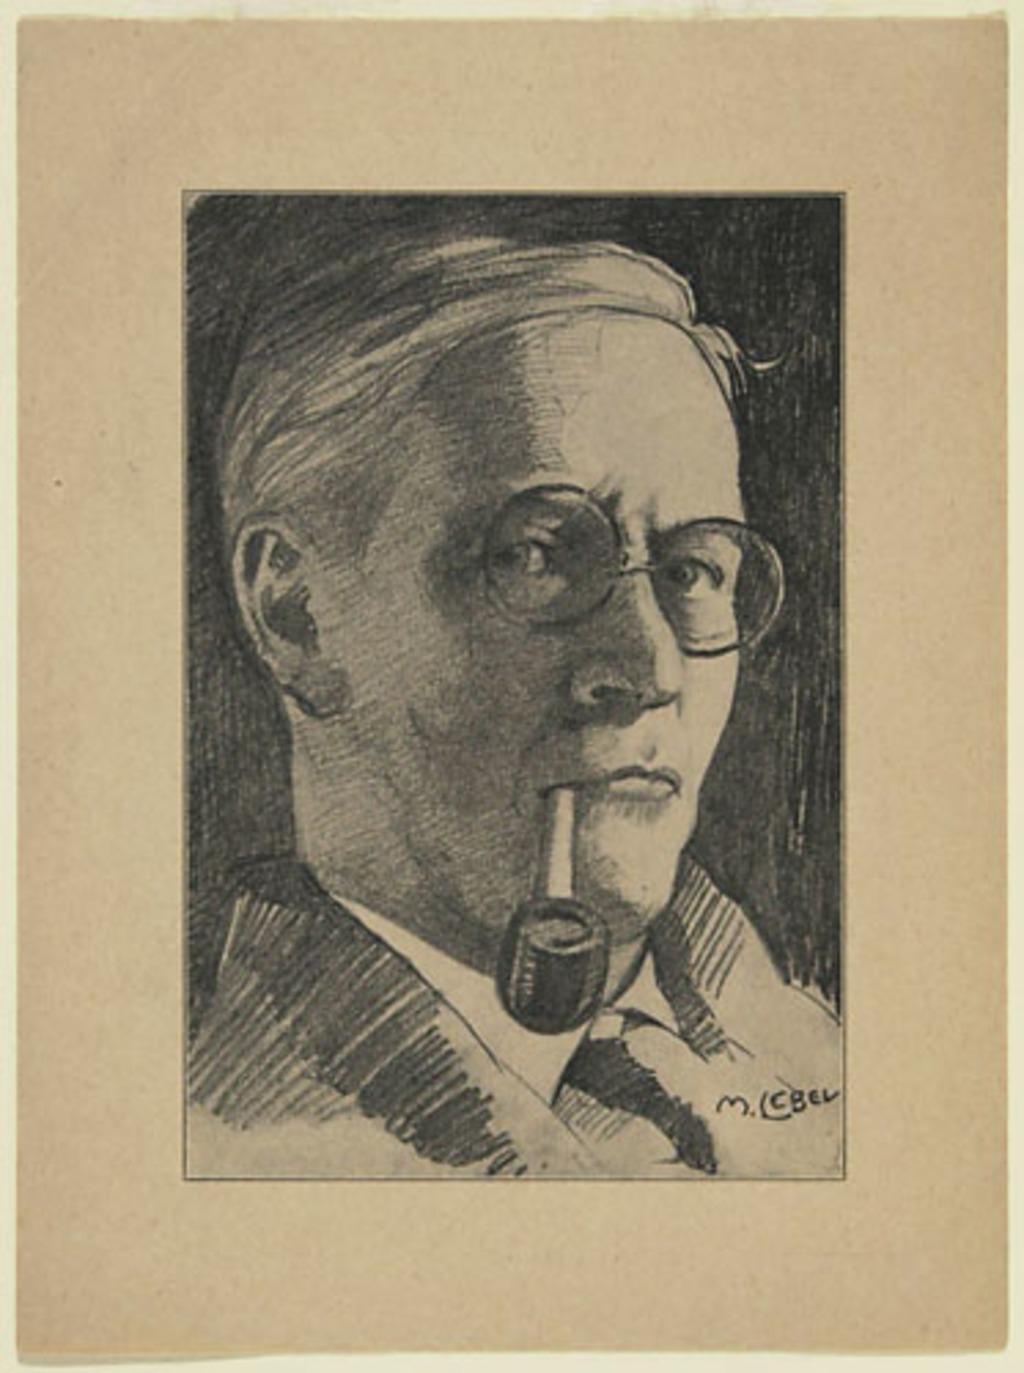 Édouard LeBel